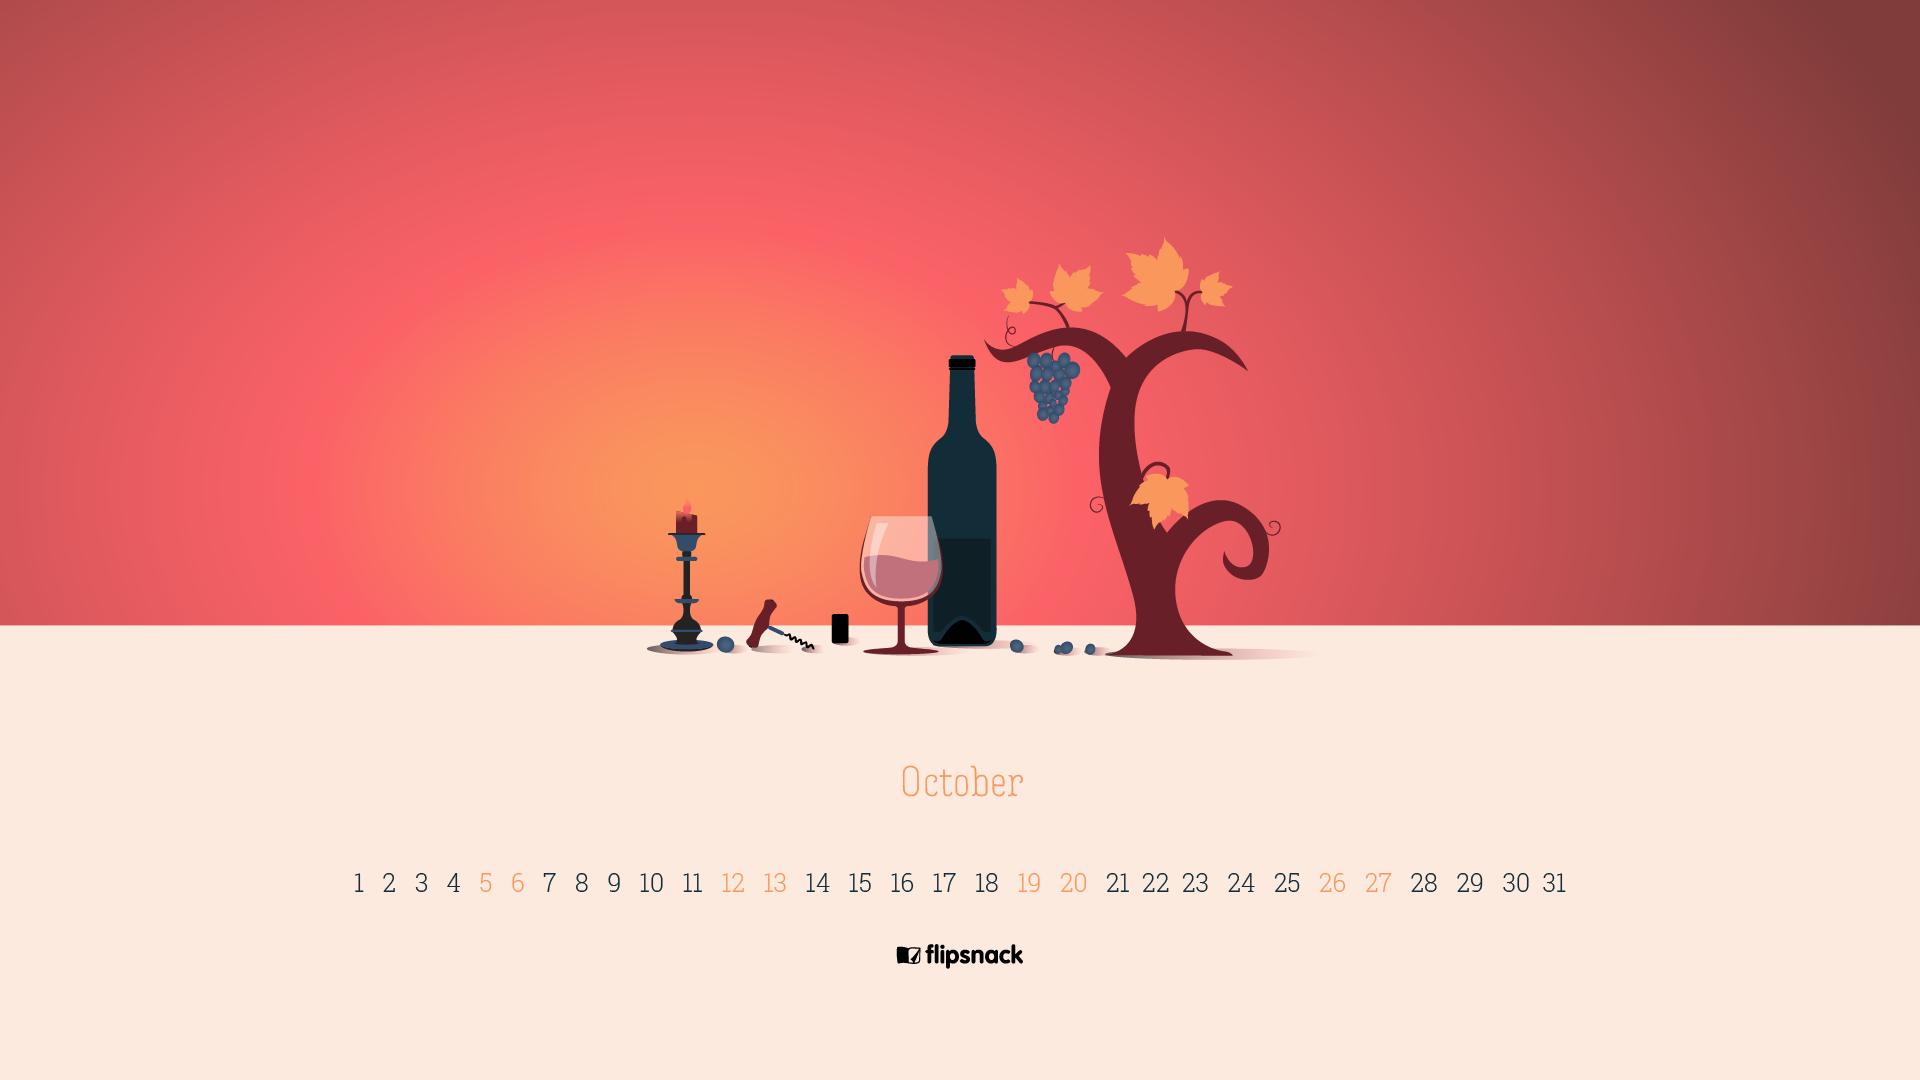 Free October 2019 Wallpaper Calendars Flipsnack Blog